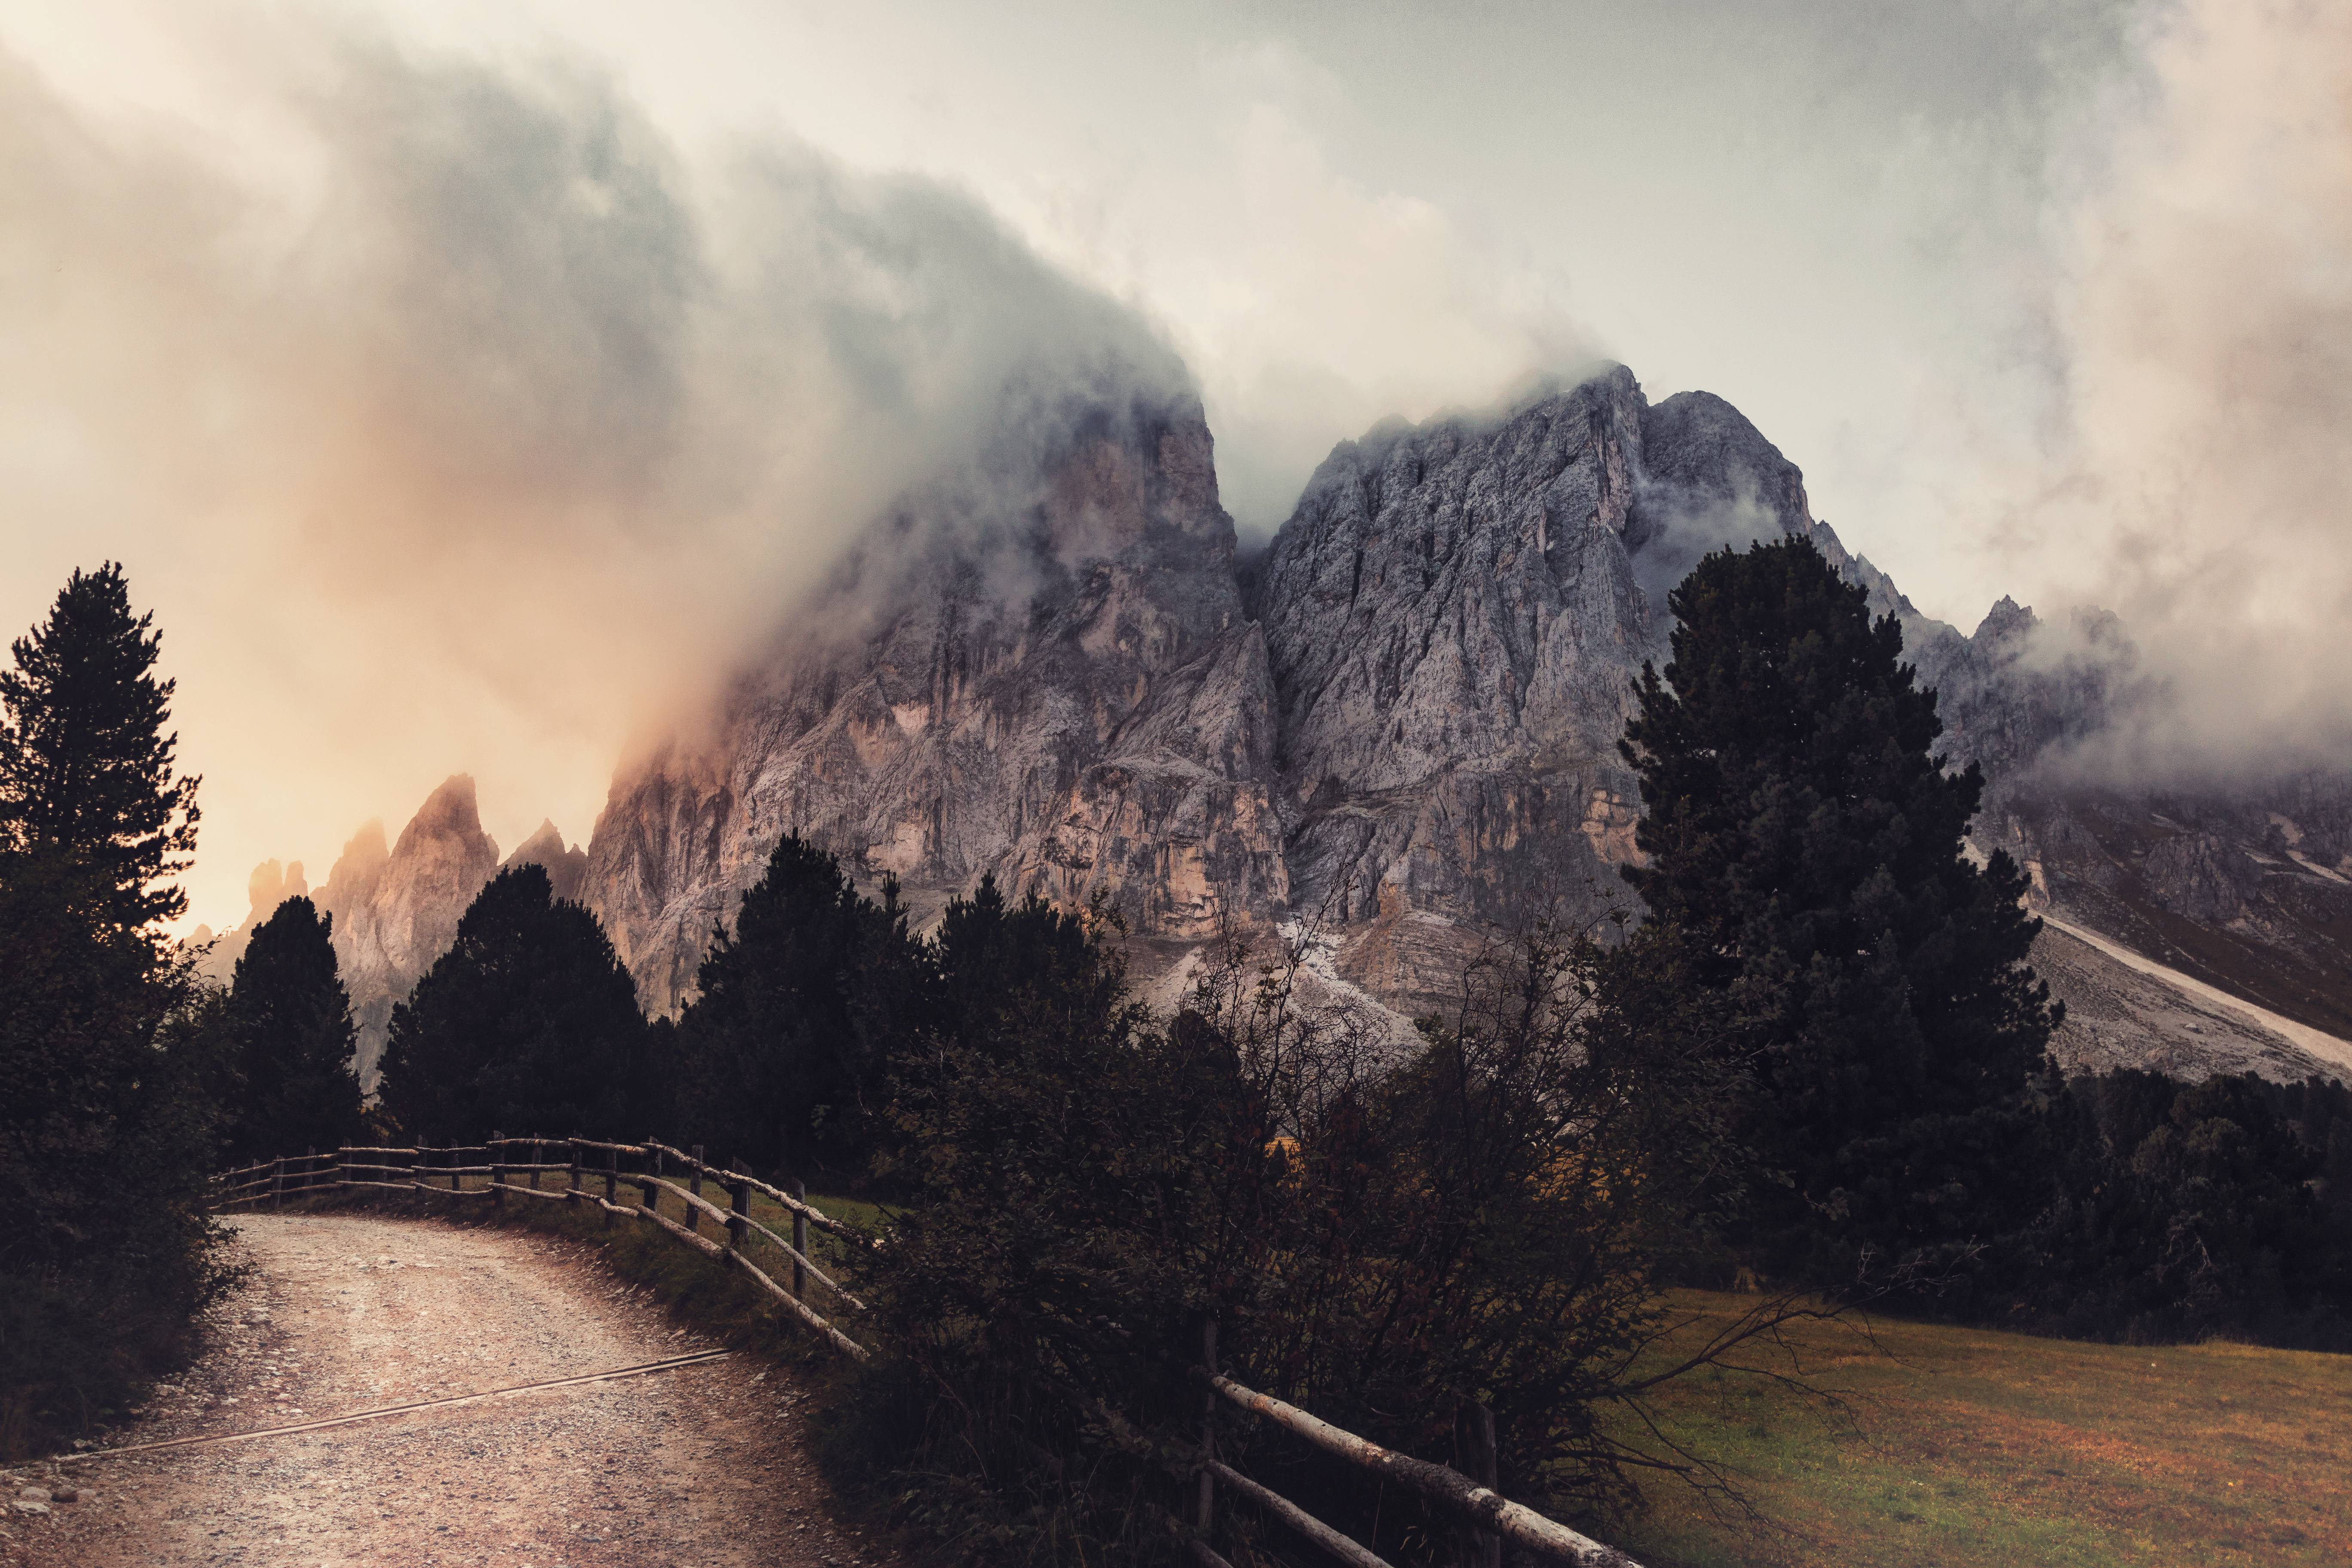 Most Inspiring Wallpaper Mountain Grey - grey-mountain-near-trees  Photograph_111957.jpg